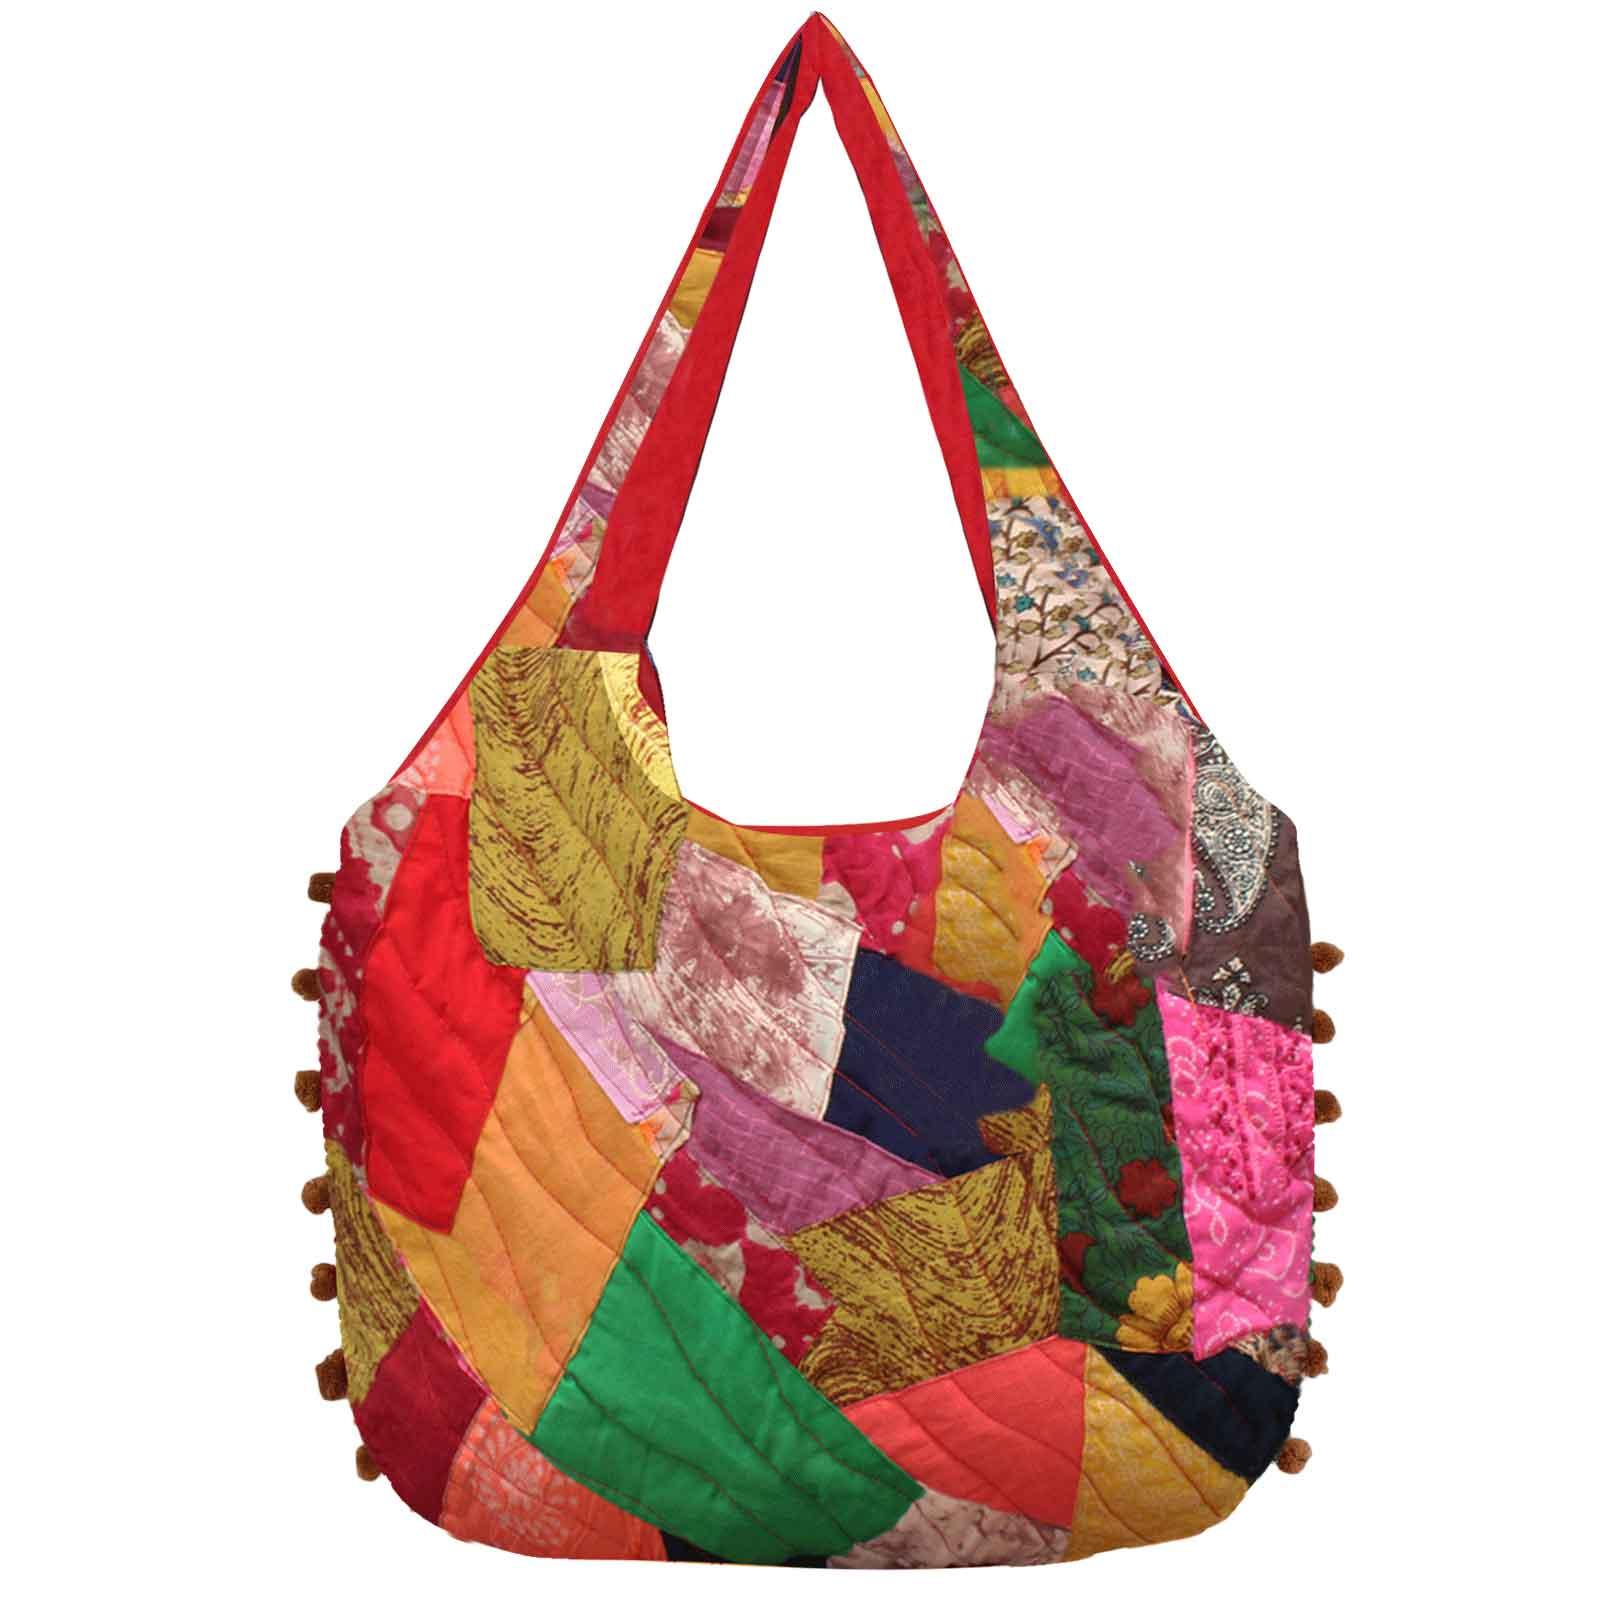 Cotton Patchwork Bag Patchwork Rag Bag Patchwork Tote